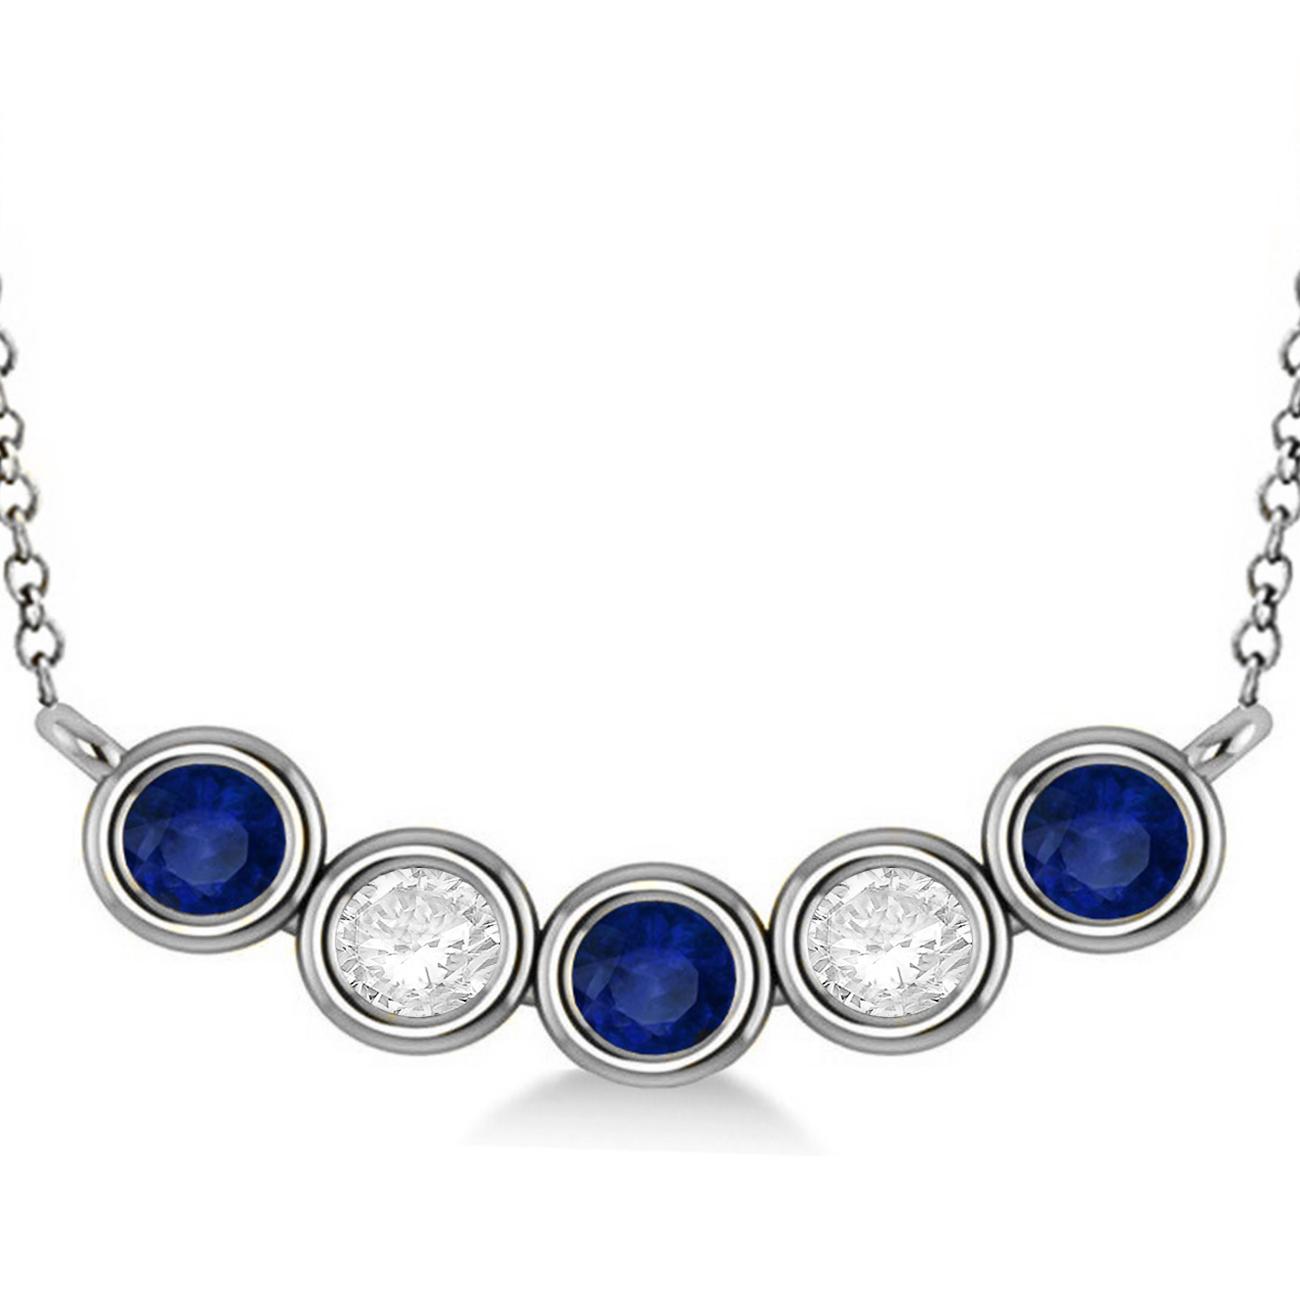 Diamond & Blue Sapphire 5-Stone Pendant Necklace 14k White Gold 2.00ct